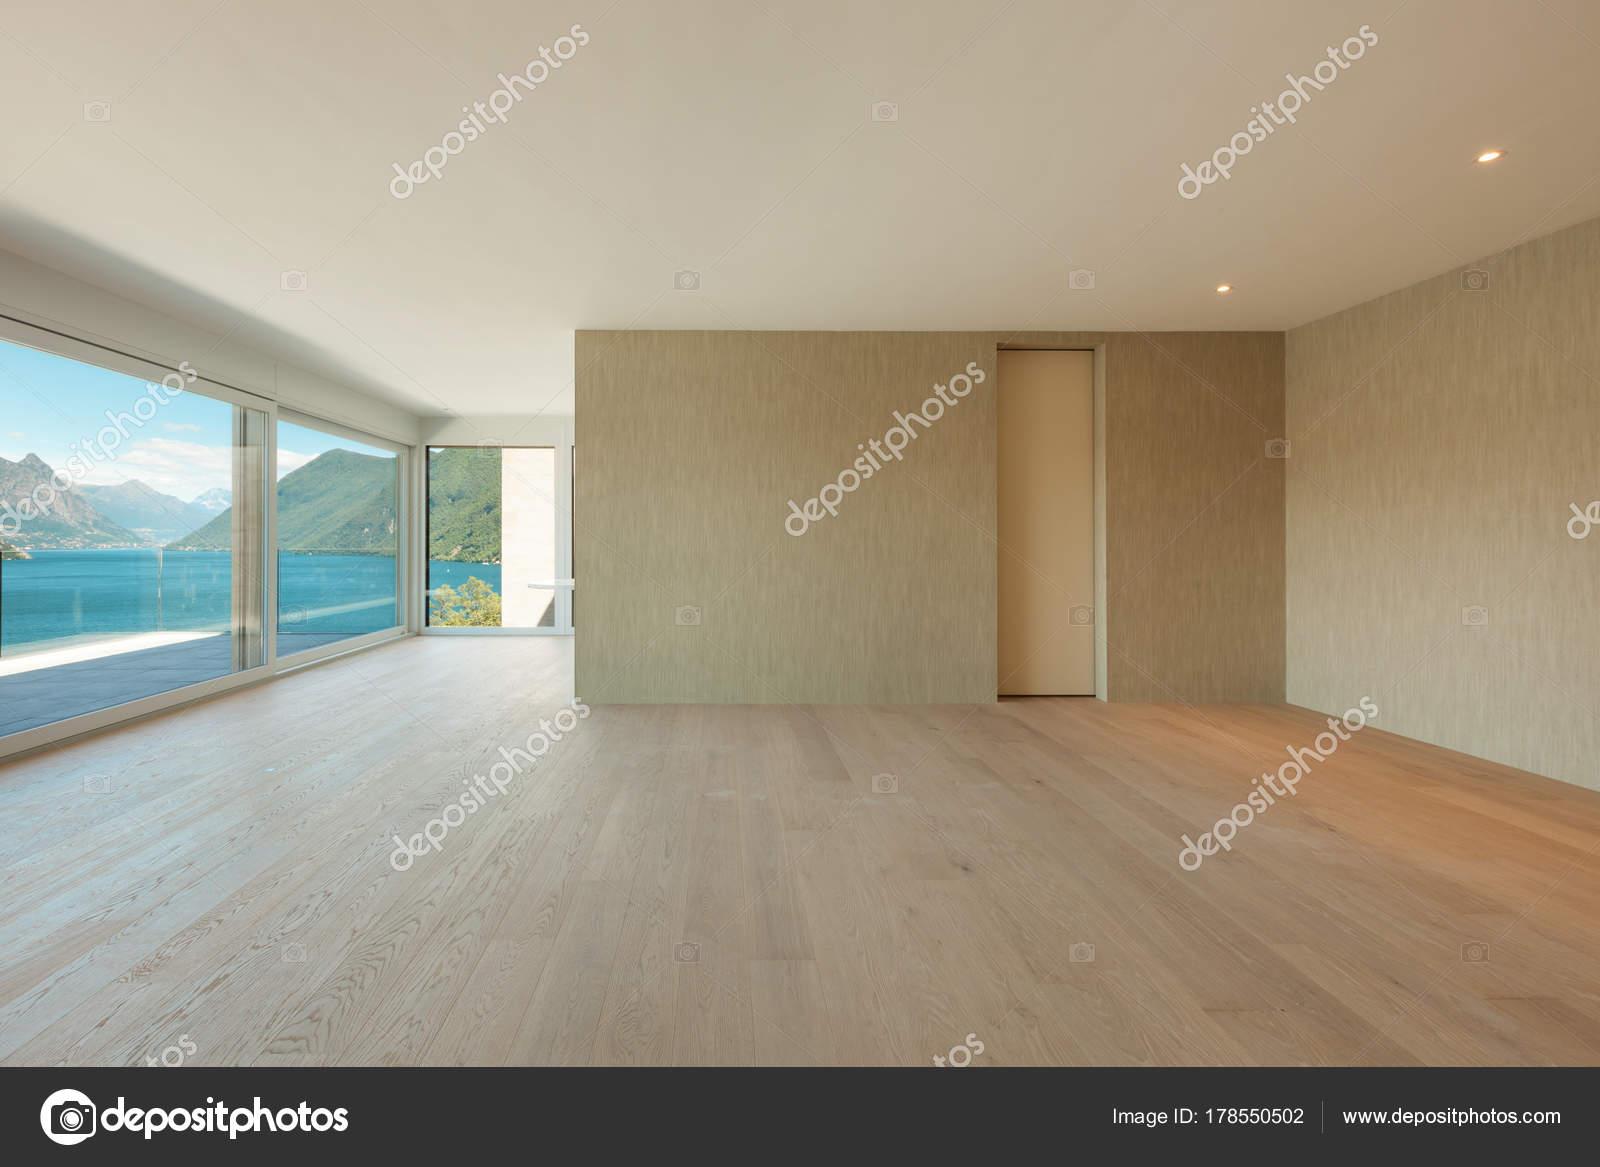 Belle Maison Moderne Interieur Photographie Zveiger C 178550502